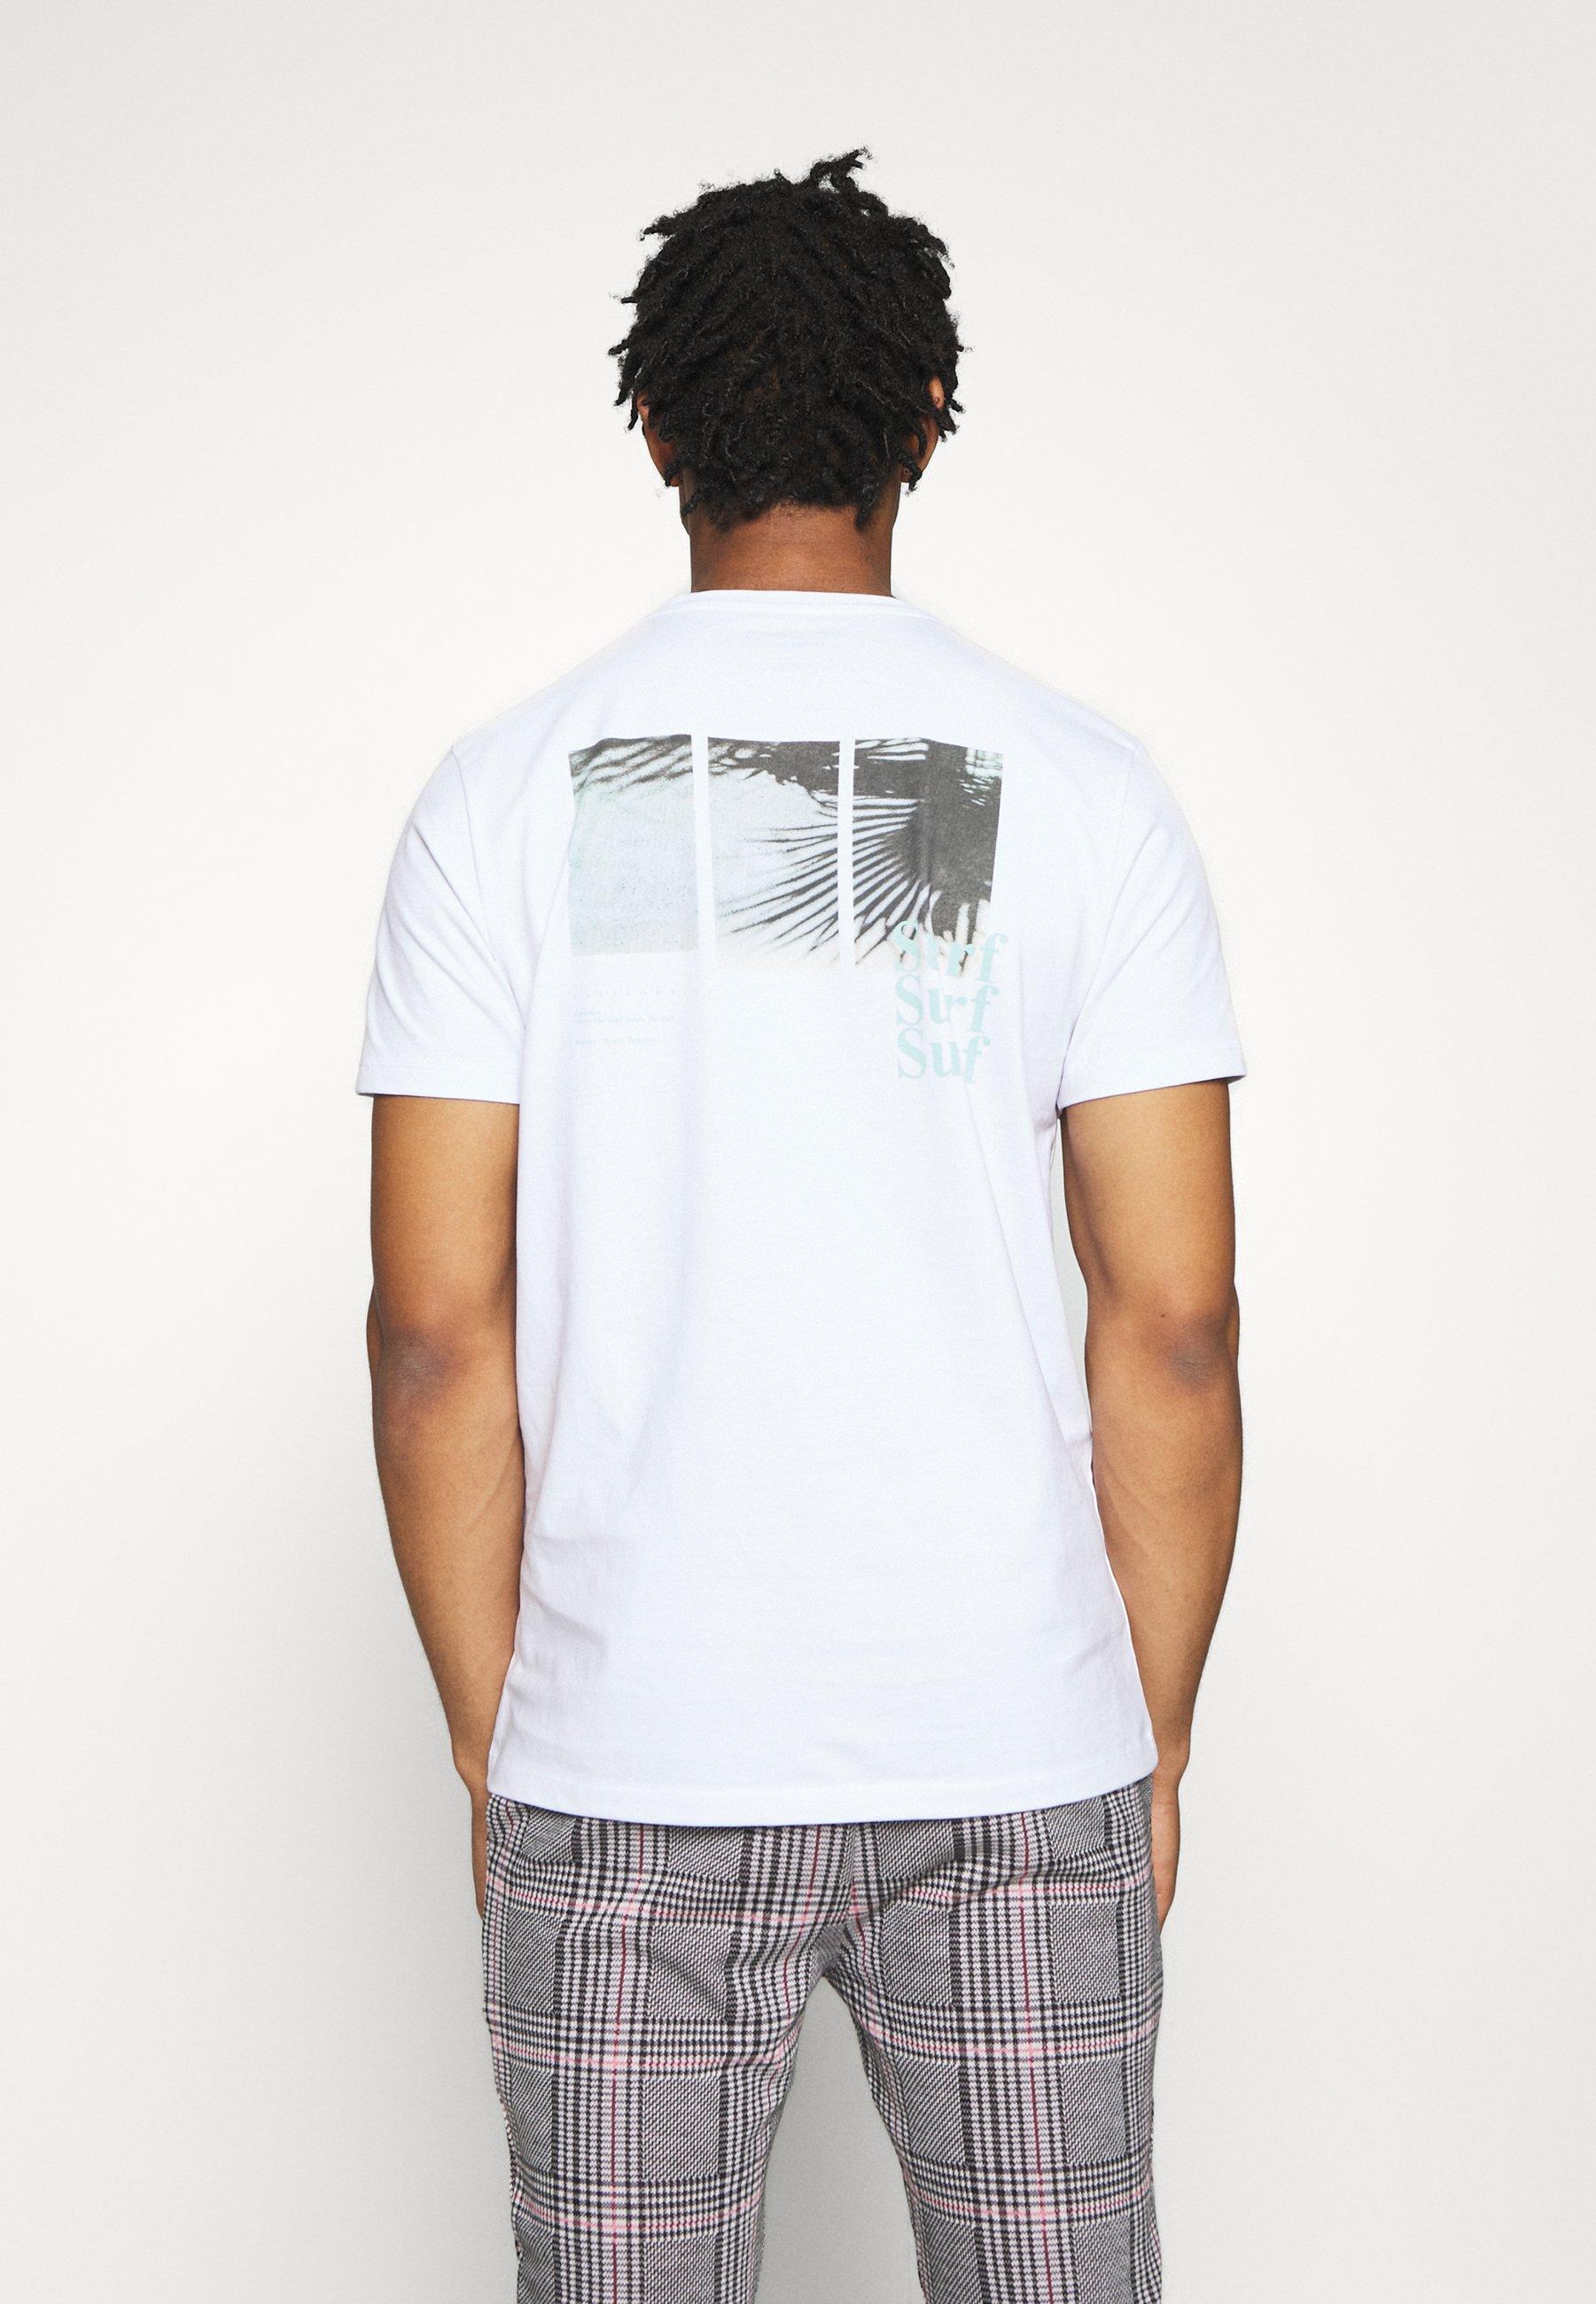 Next Långärmad tröja - white/vit - Herrkläder aJMOq